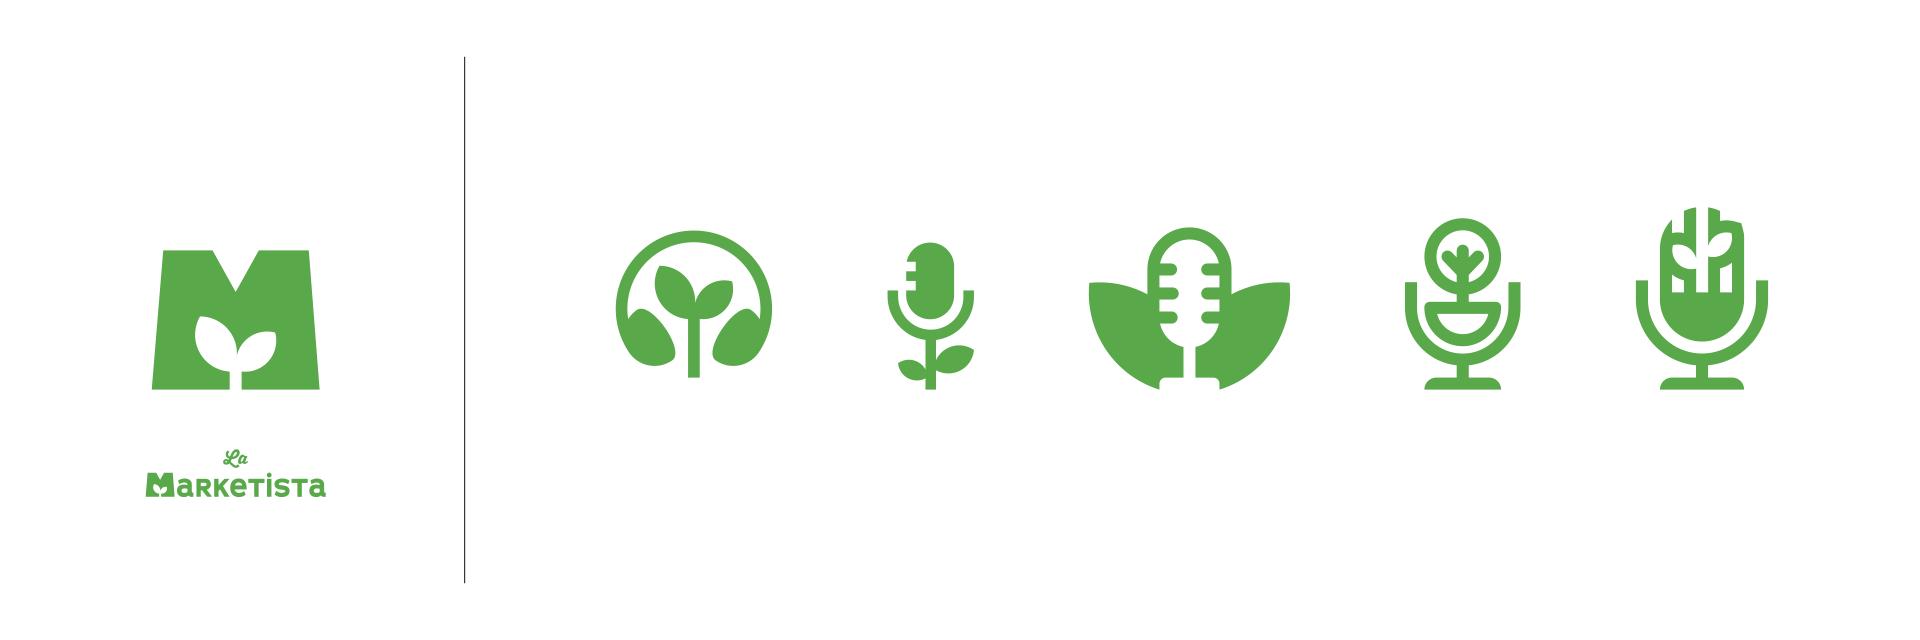 Brandstof logo concepts